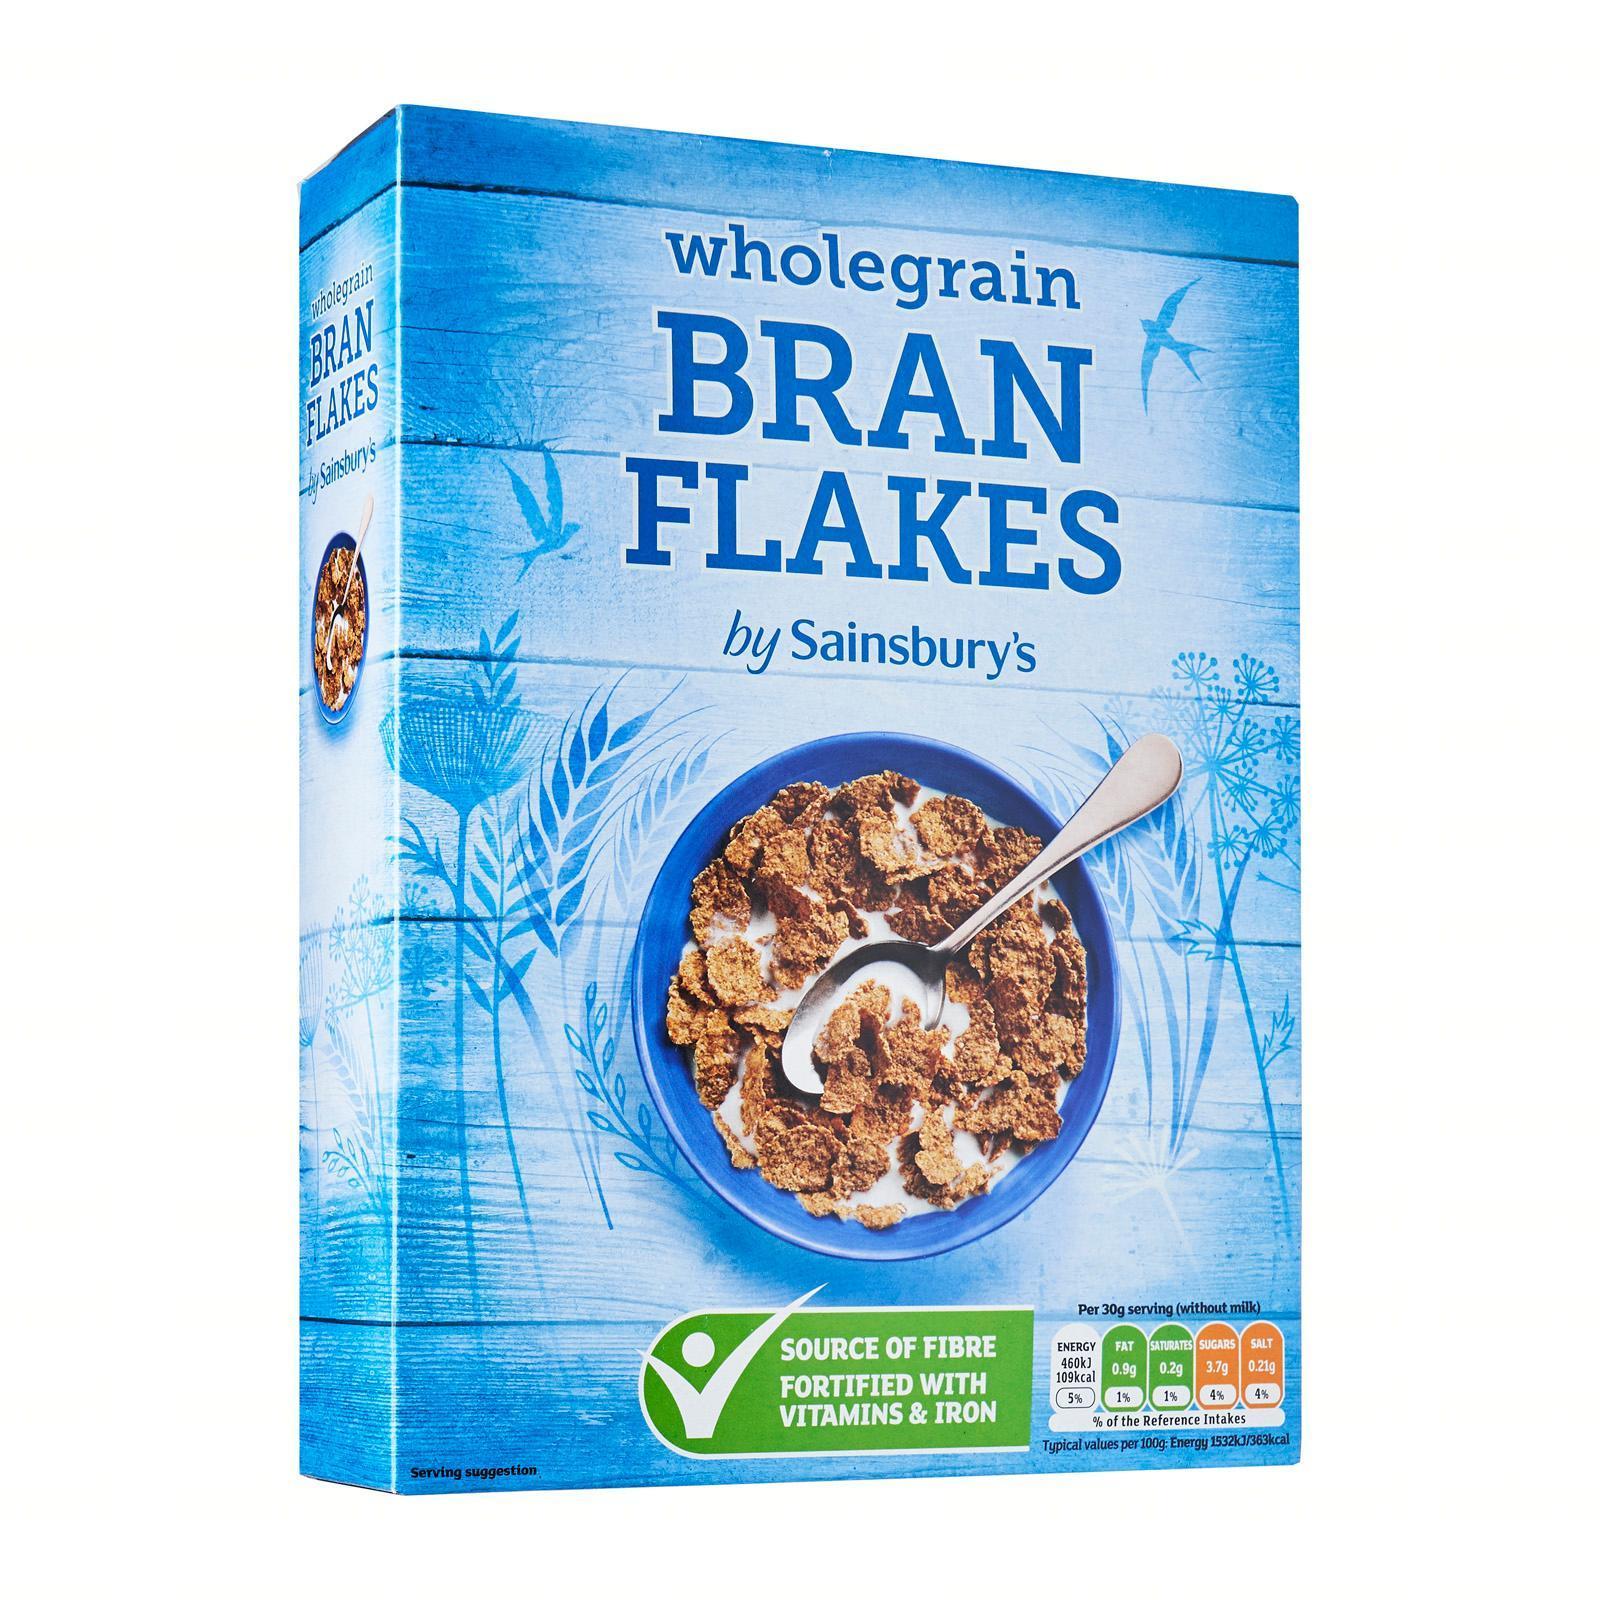 Sainsbury's Wholegrain Bran Flakes